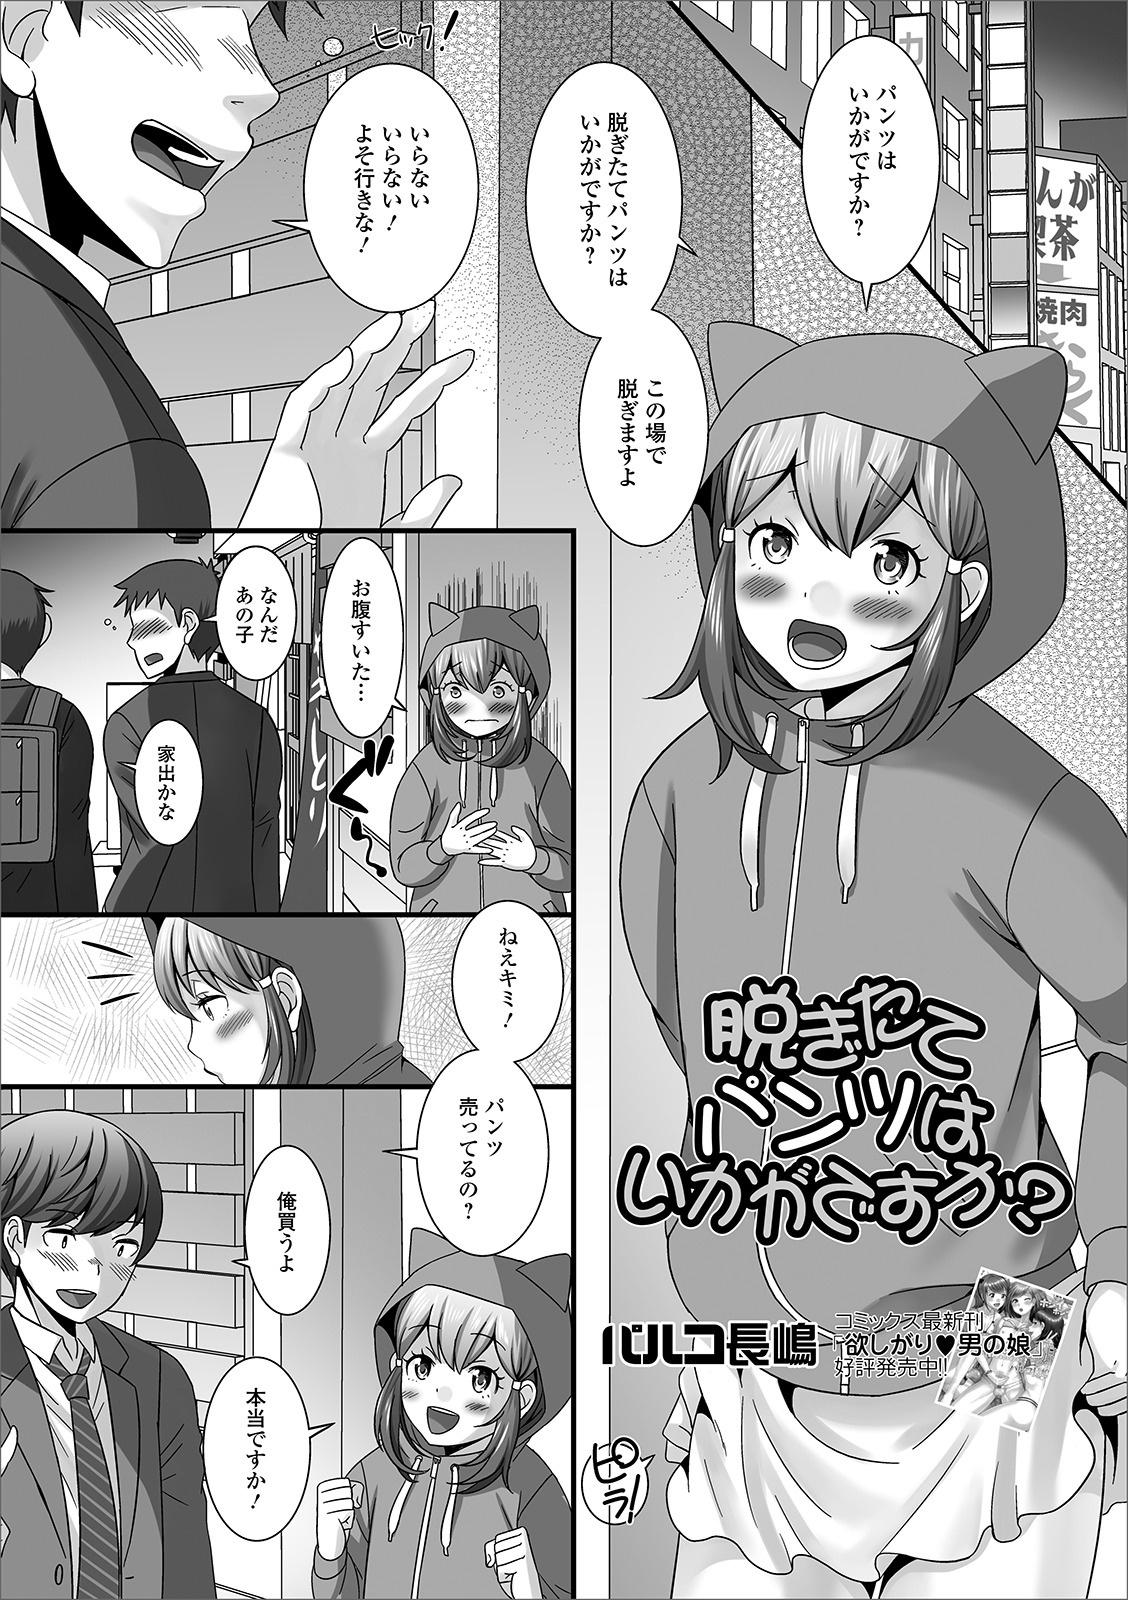 Gekkan Web Otoko no Ko-llection! S Vol. 43 22